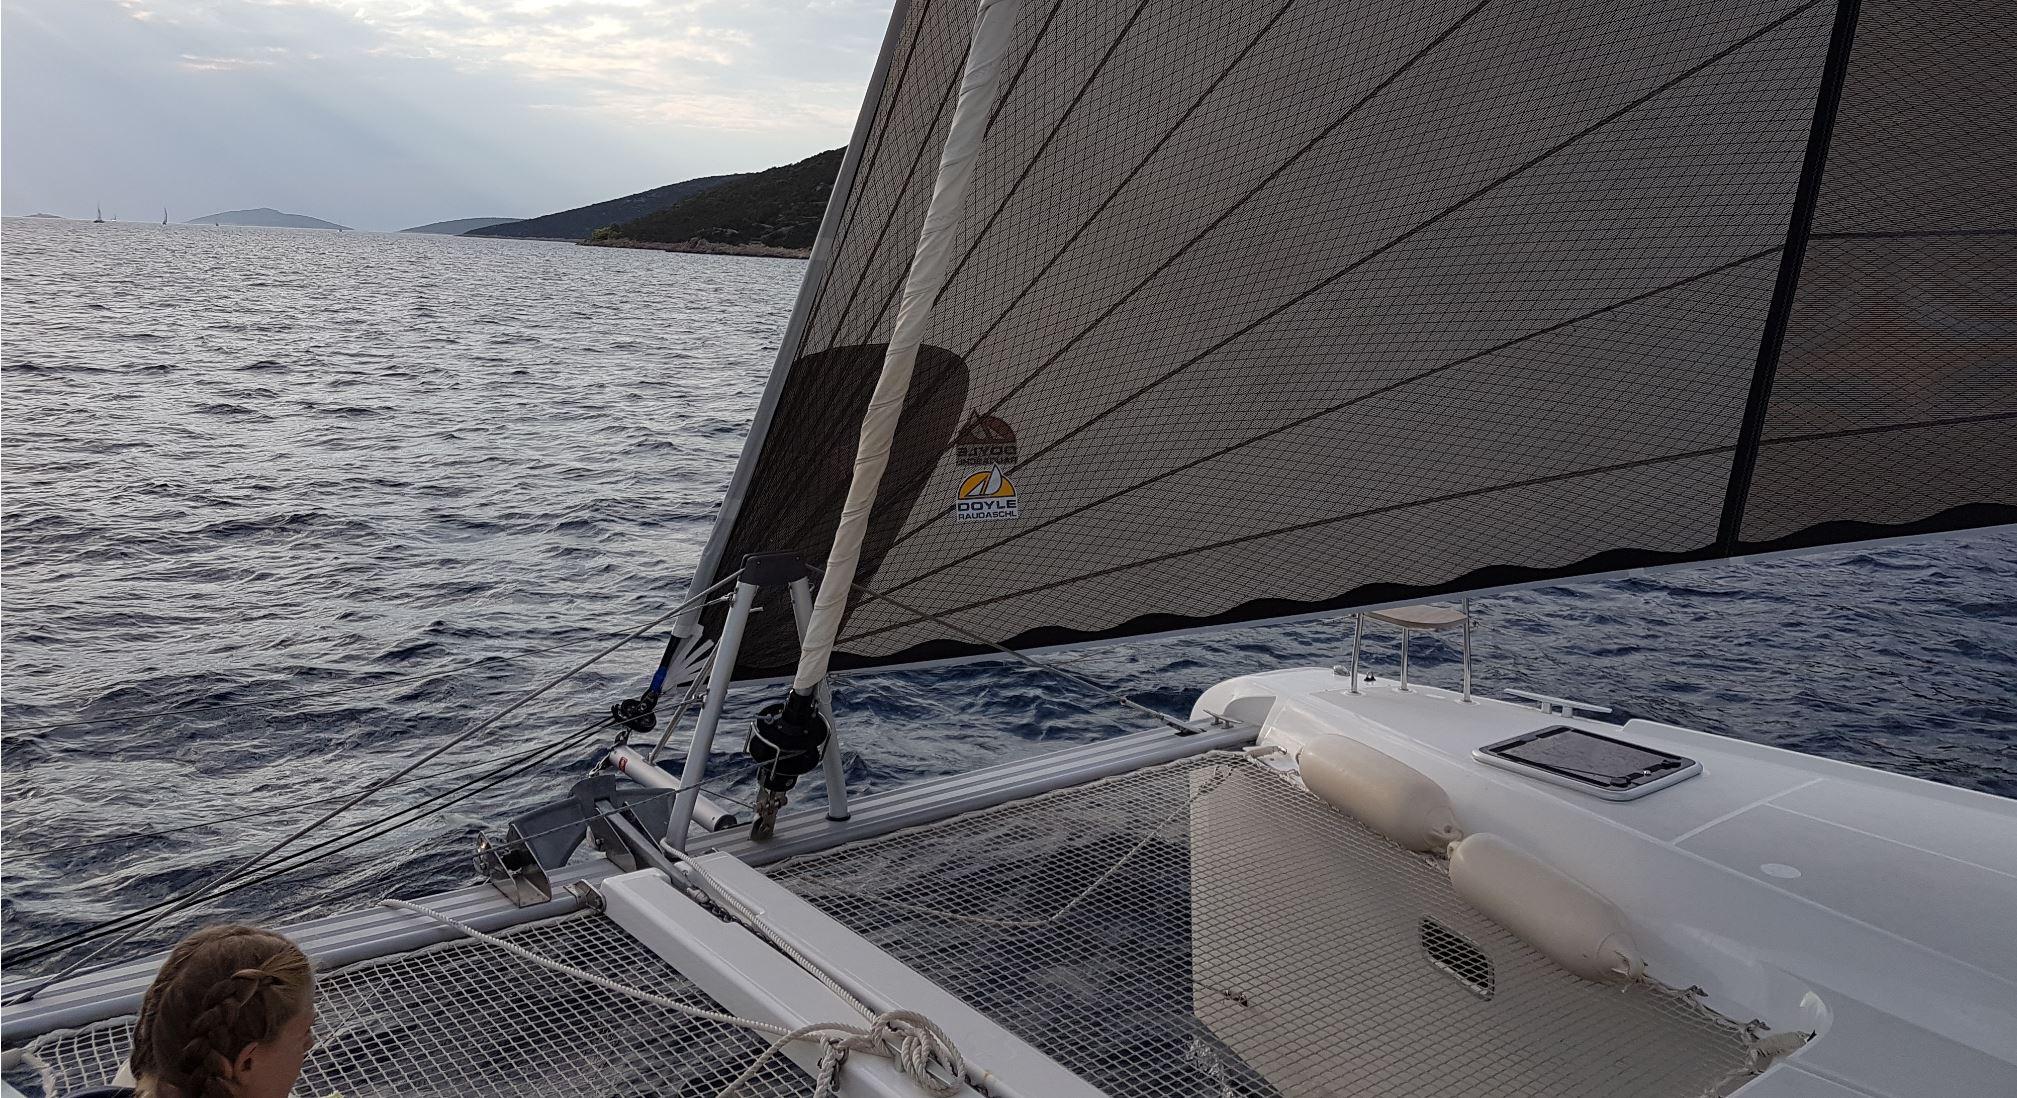 Super Entspantes Segeln mit Skipper Ehepaar - Urlaubsegeln Teneriffa